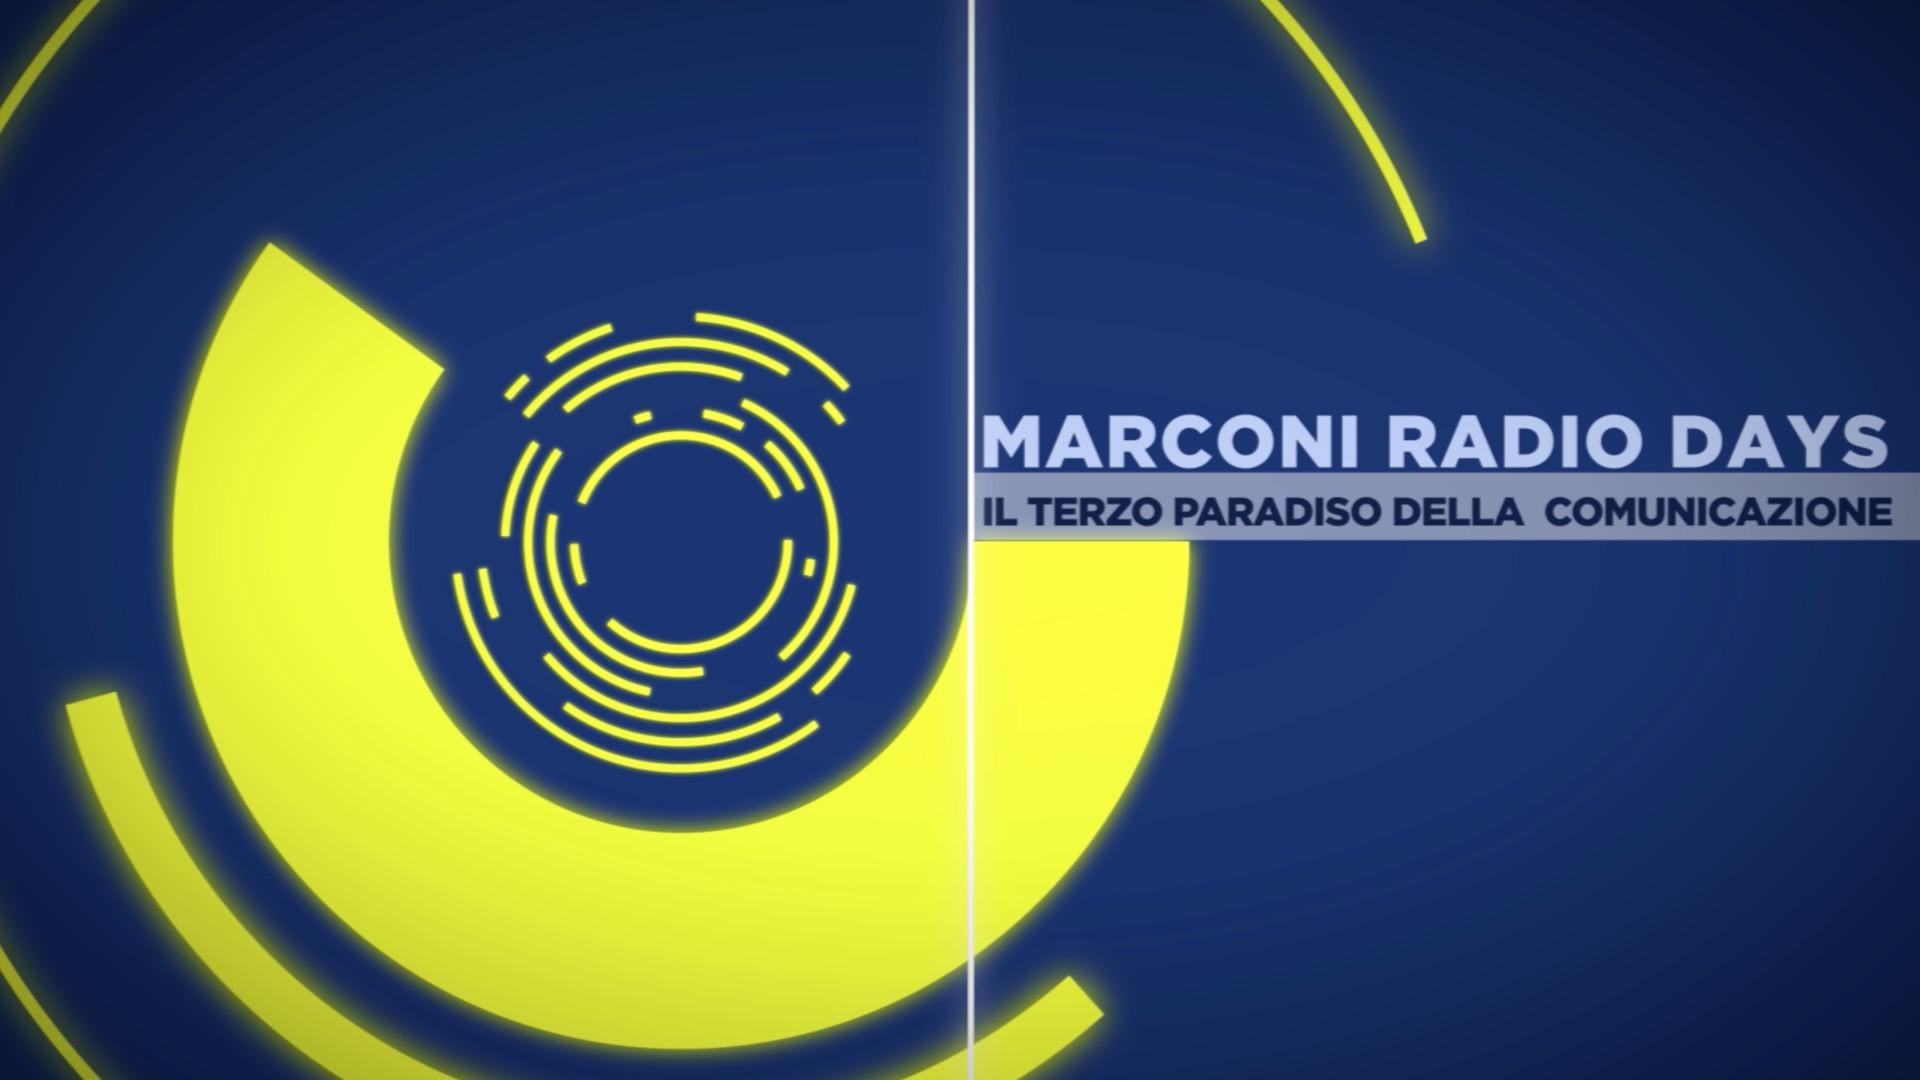 Marconi Radio Days